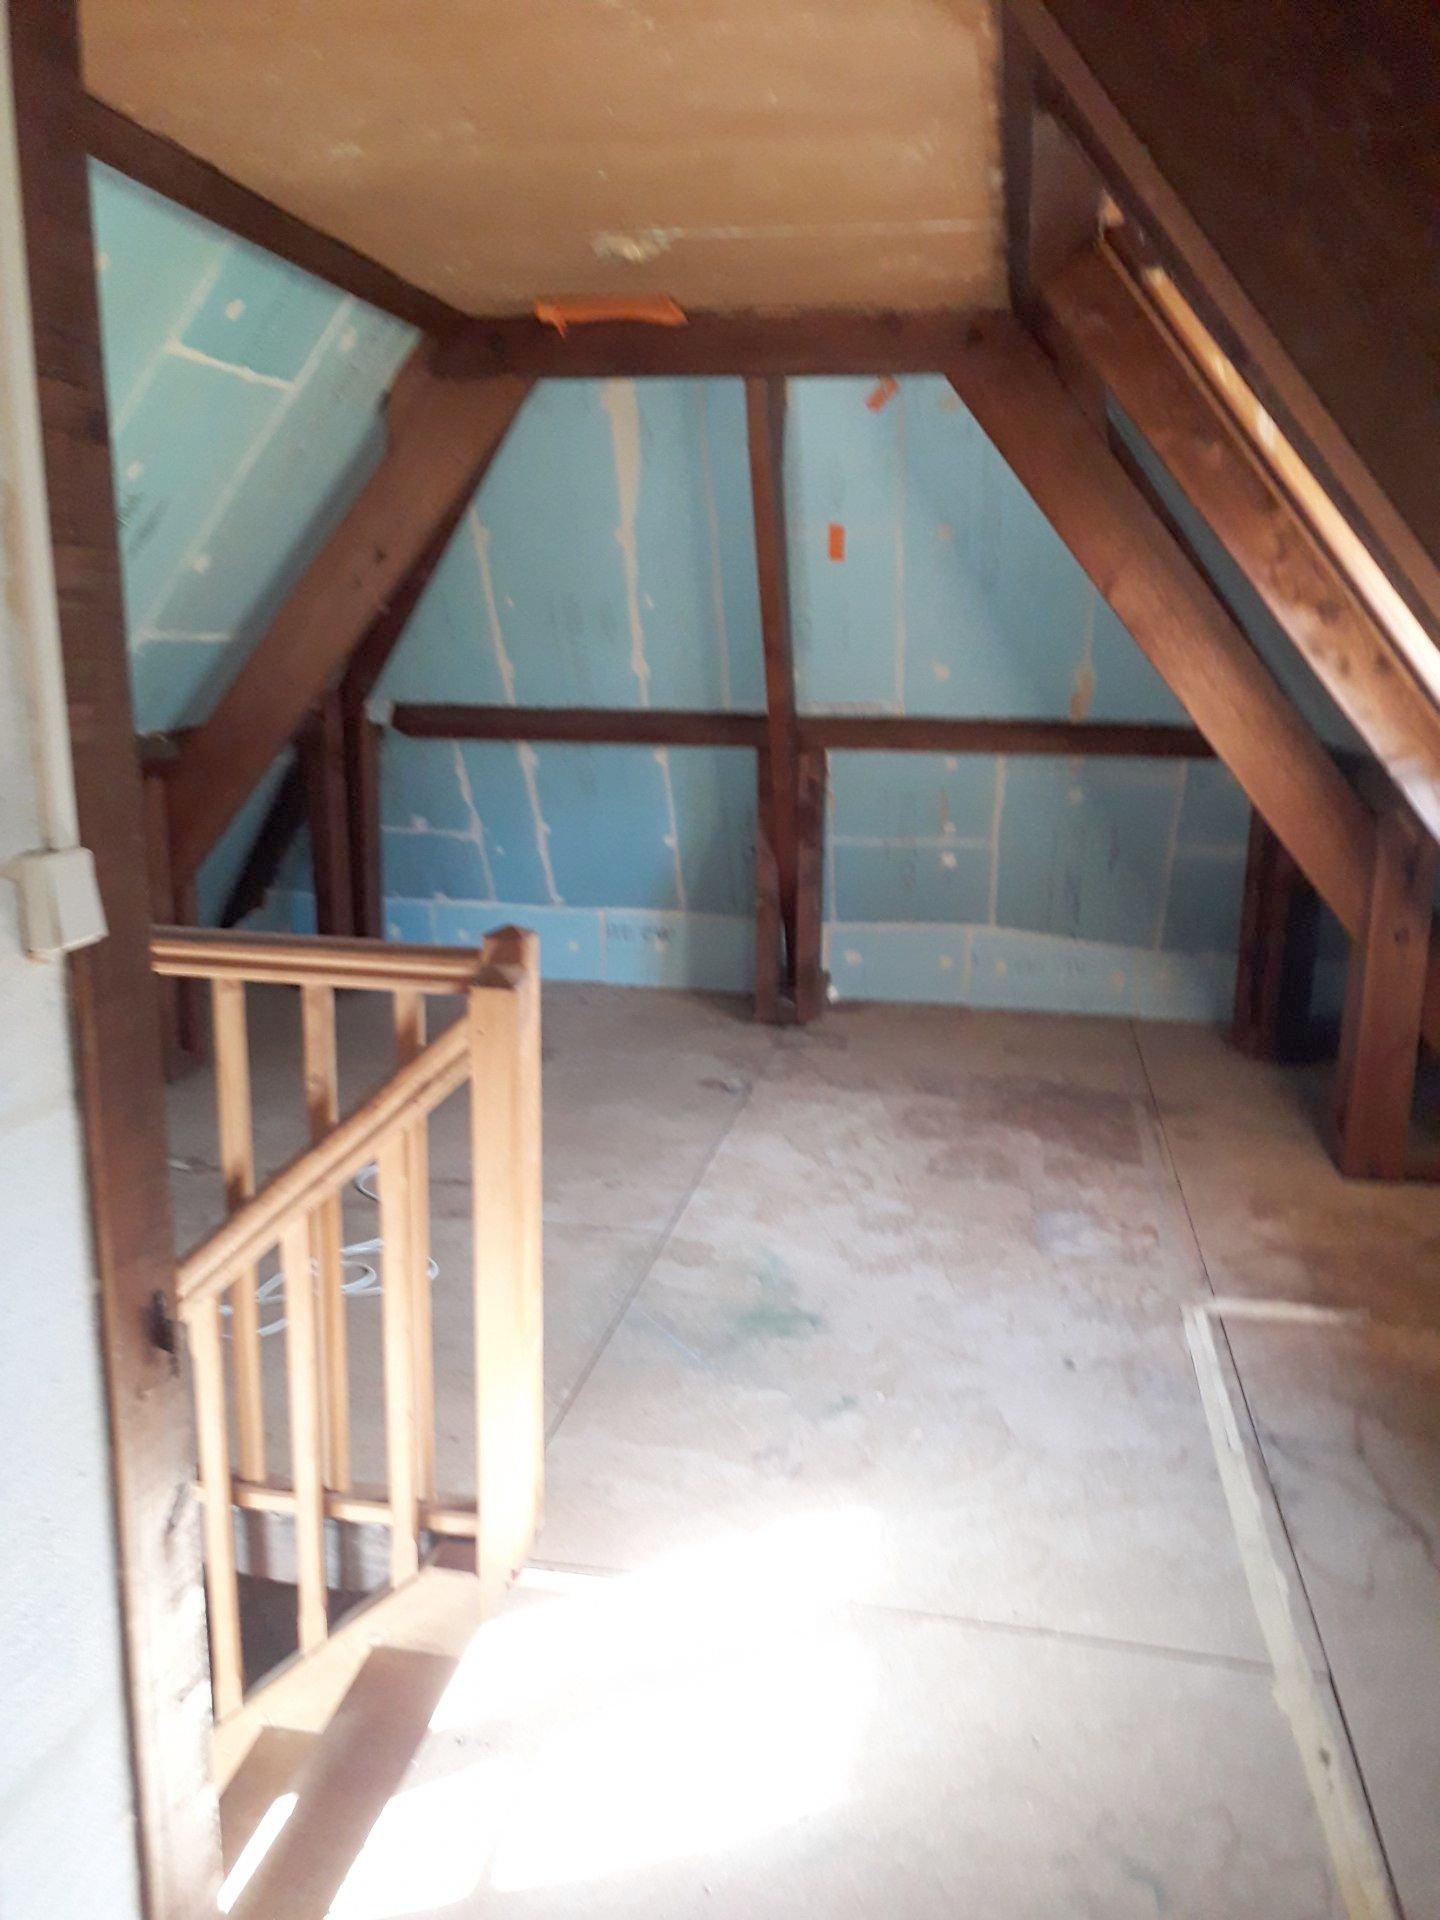 Maison périgourdine ancienne restaurée